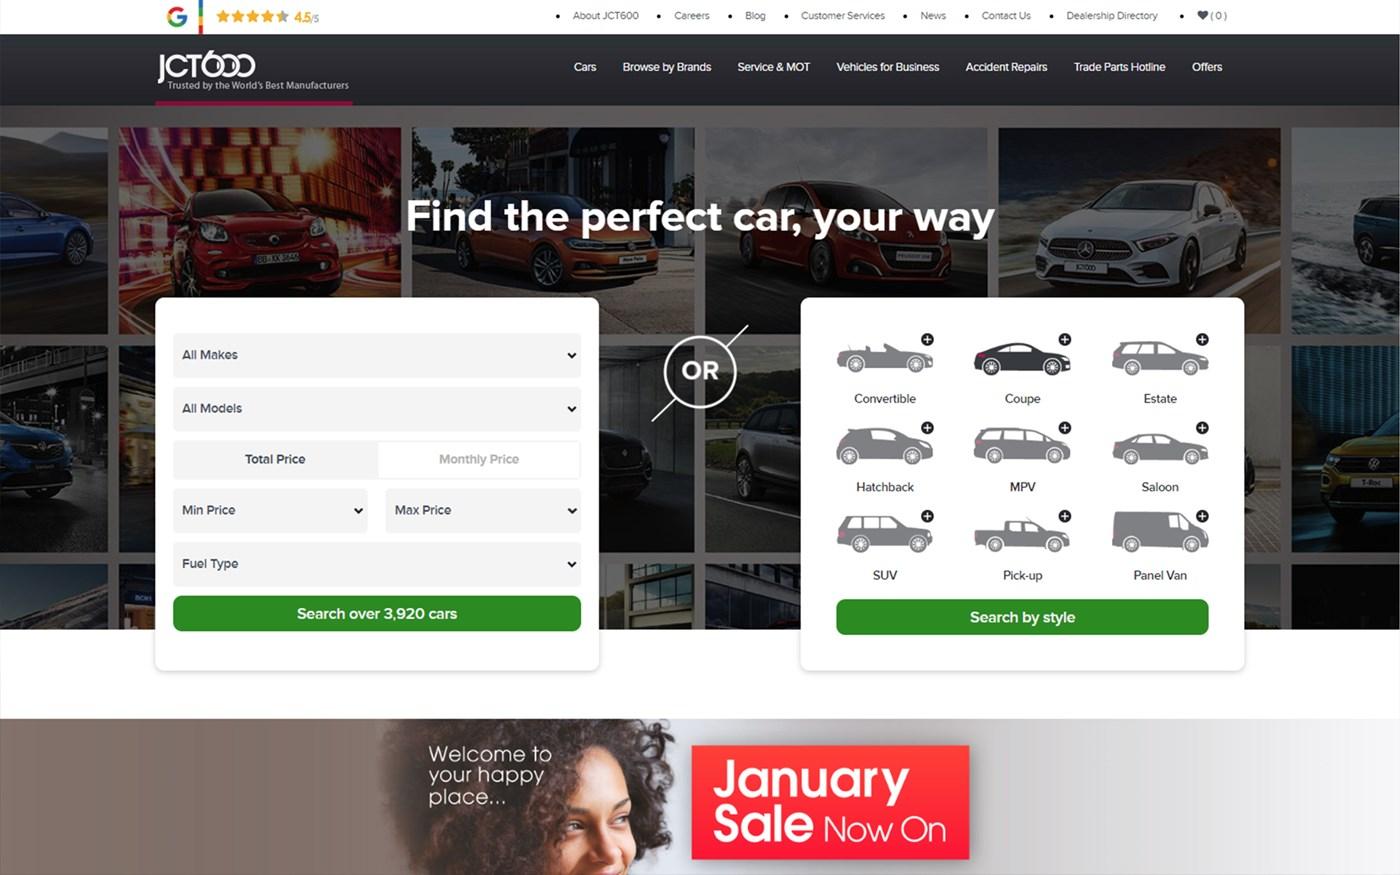 JCT600 website homepage